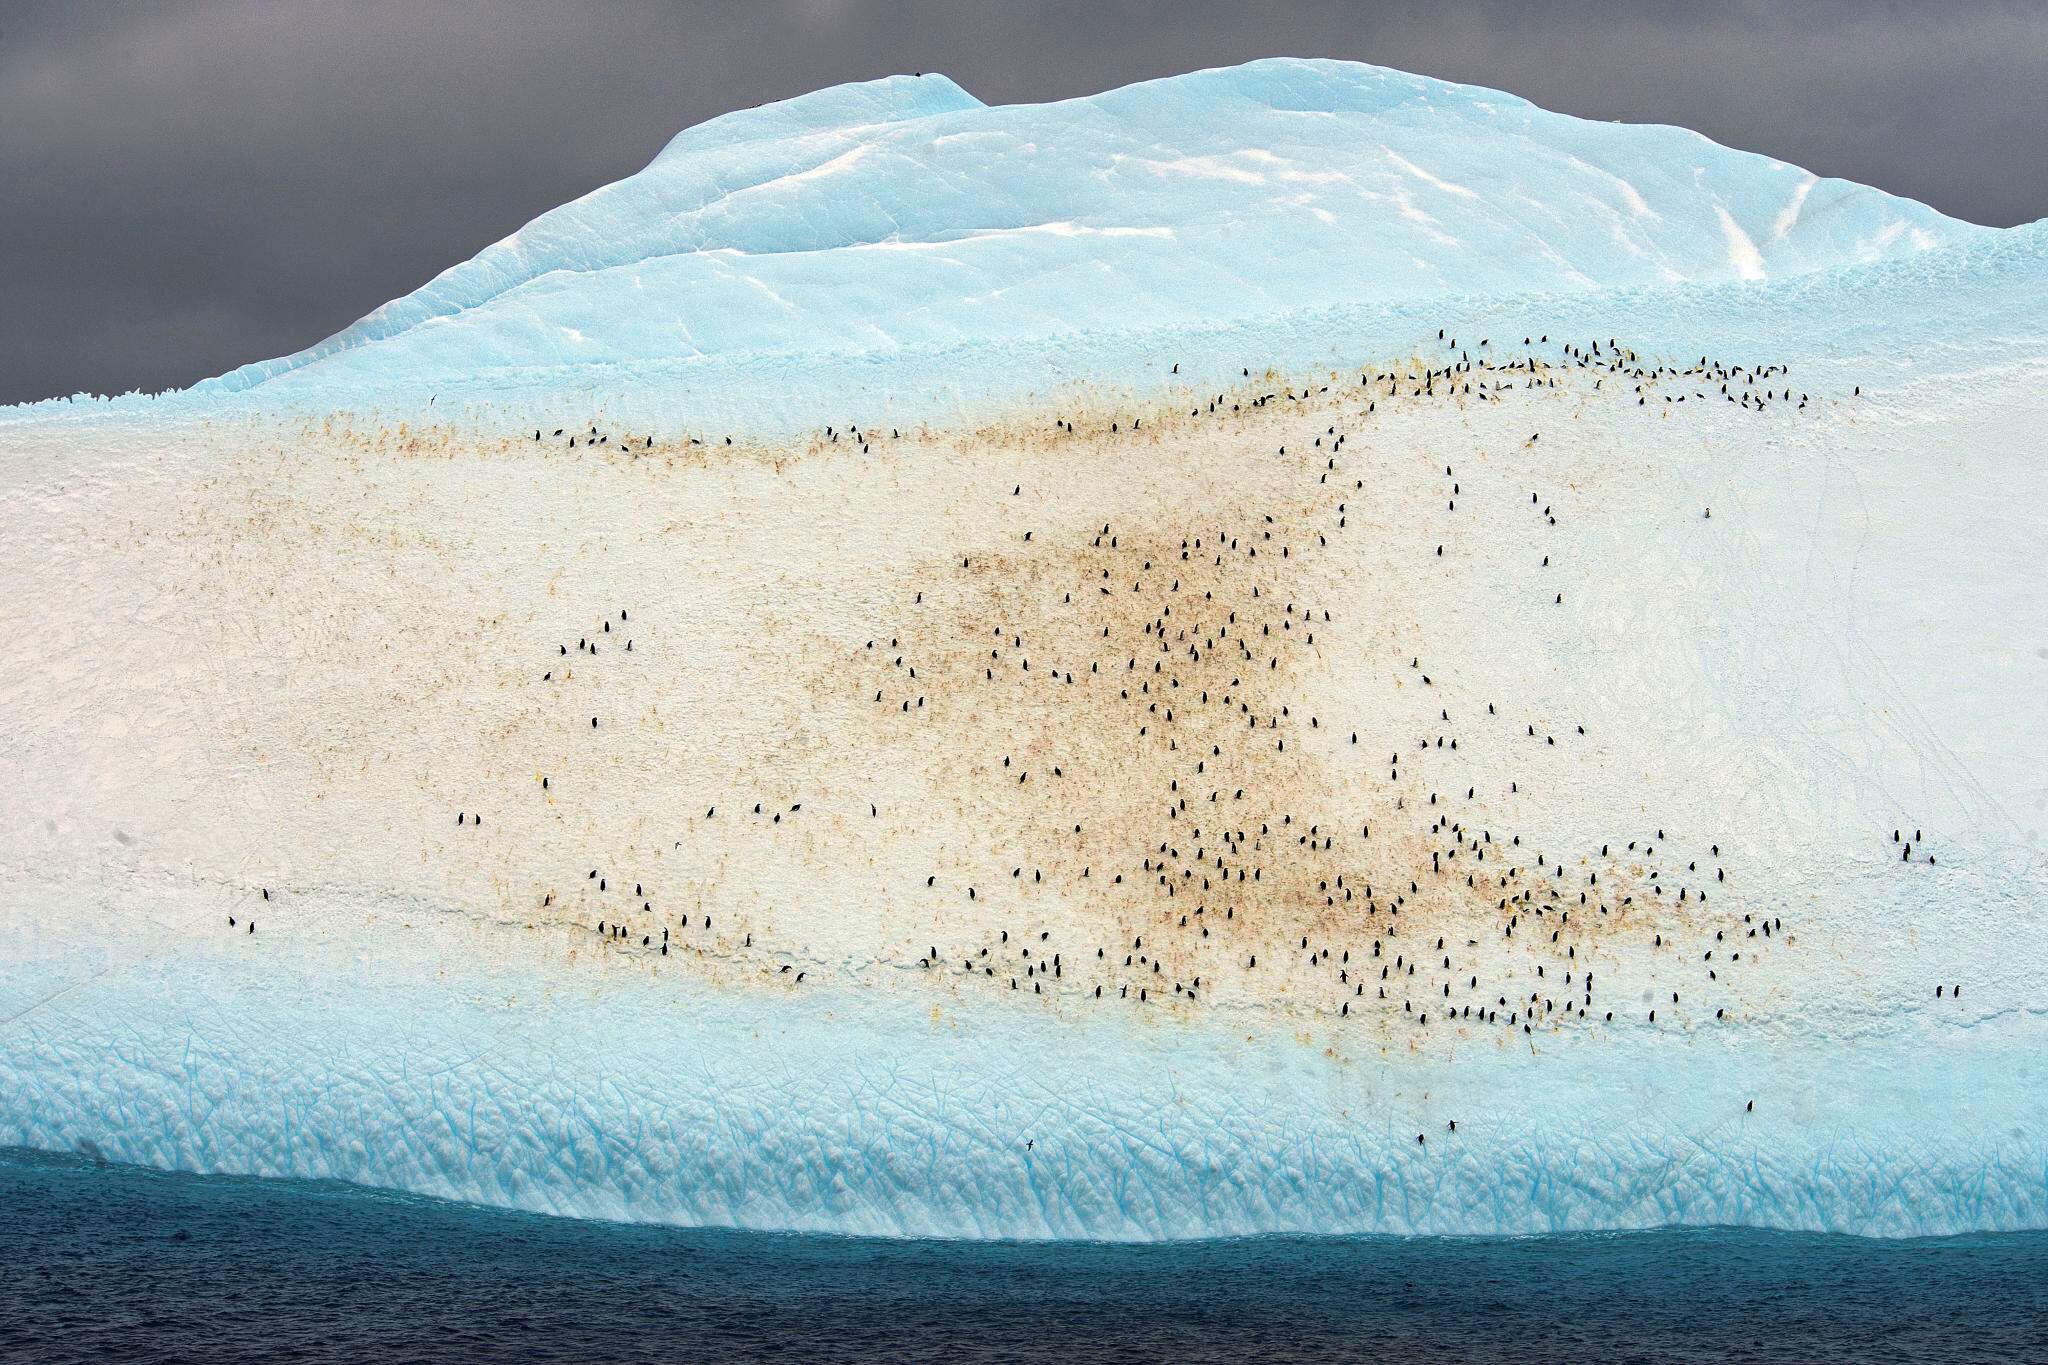 Adelie Penguins and Chinstrap Penguins mingle on an iceberg. Christopher Michel @ChrisMichel